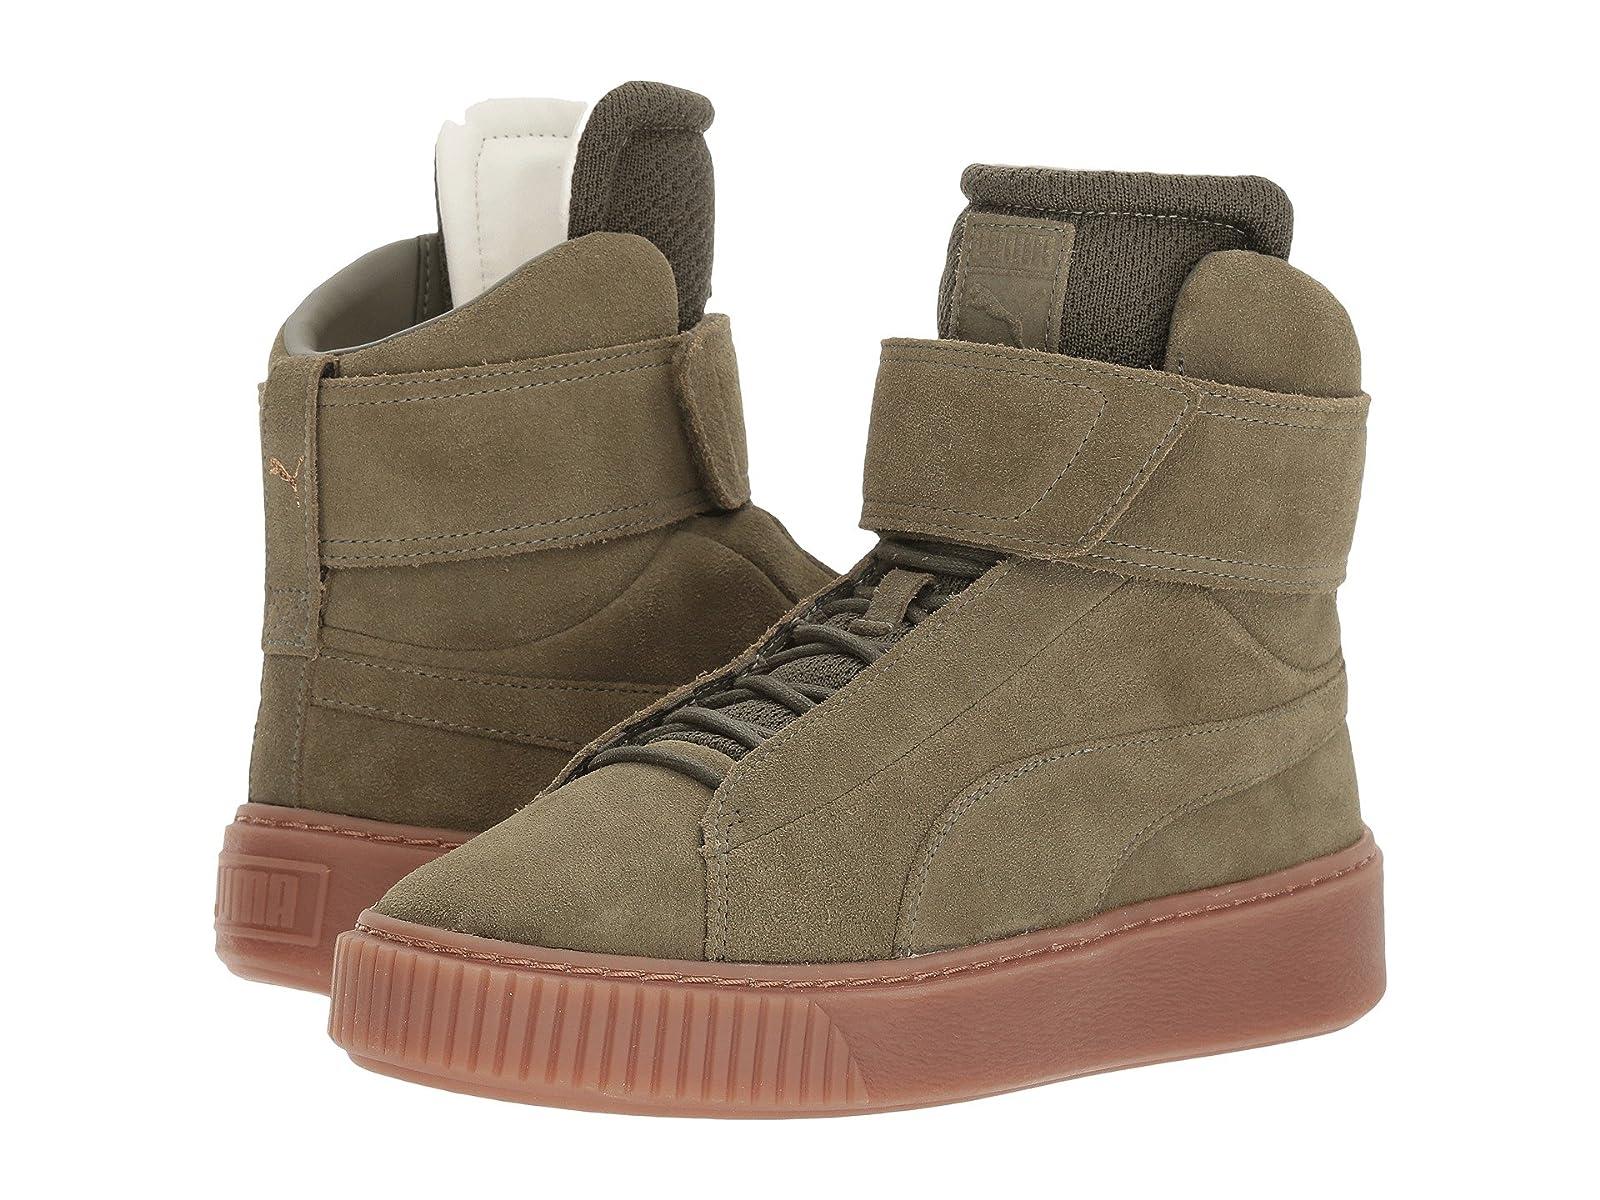 PUMA Puma Platform Mid OWCheap and distinctive eye-catching shoes